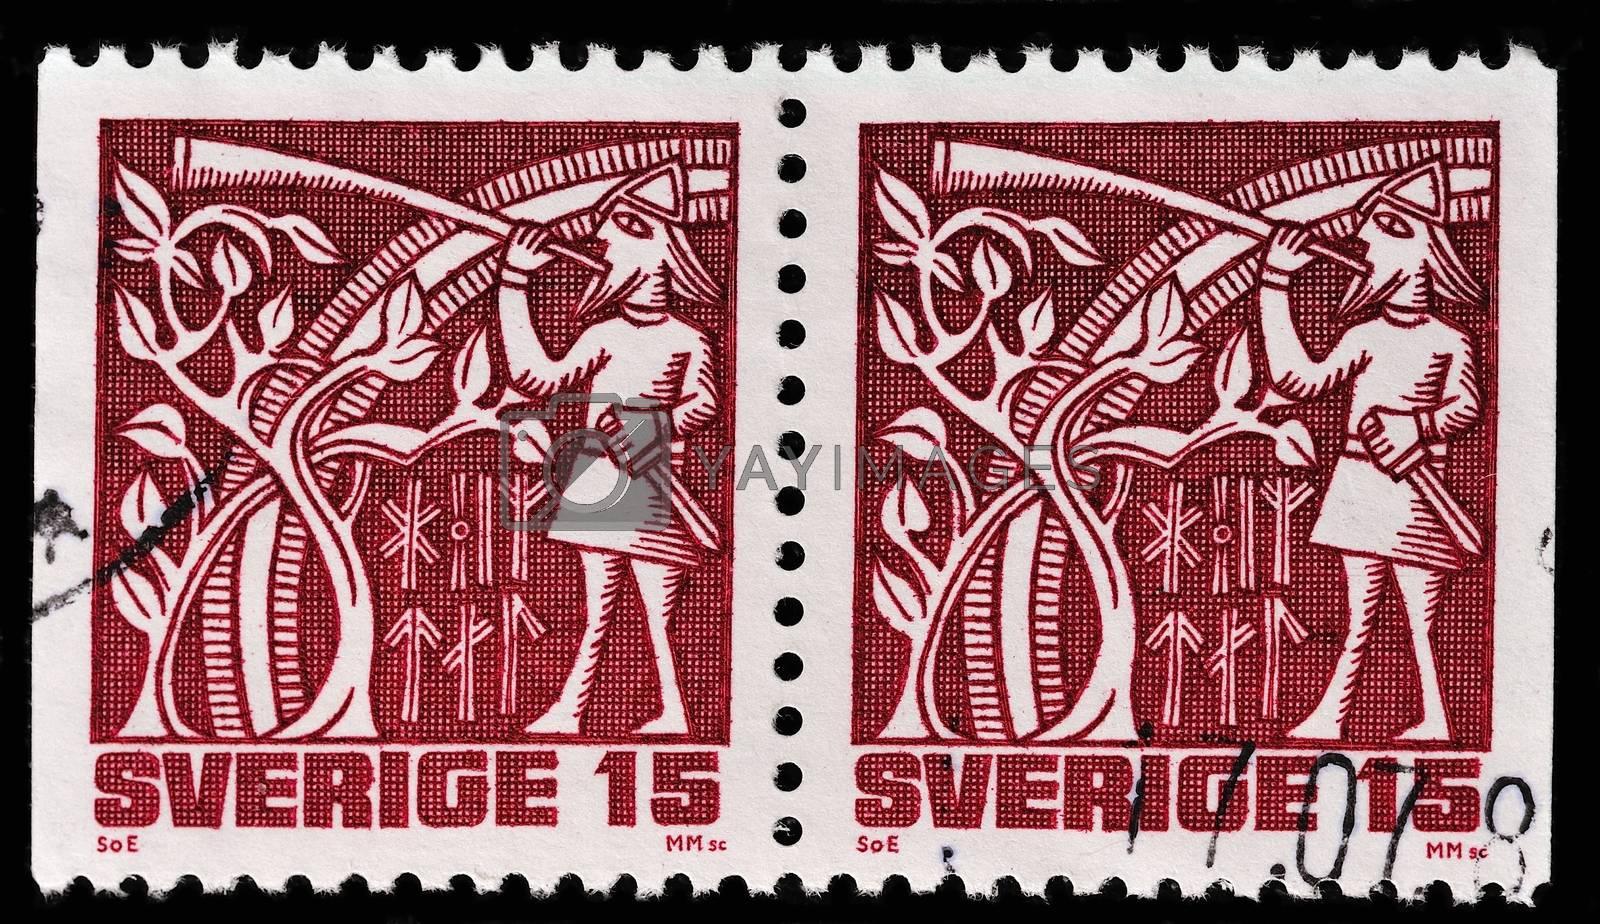 SWEDEN - CIRCA 1981: stamp printed by Sweden, shows Frey, circa 1981